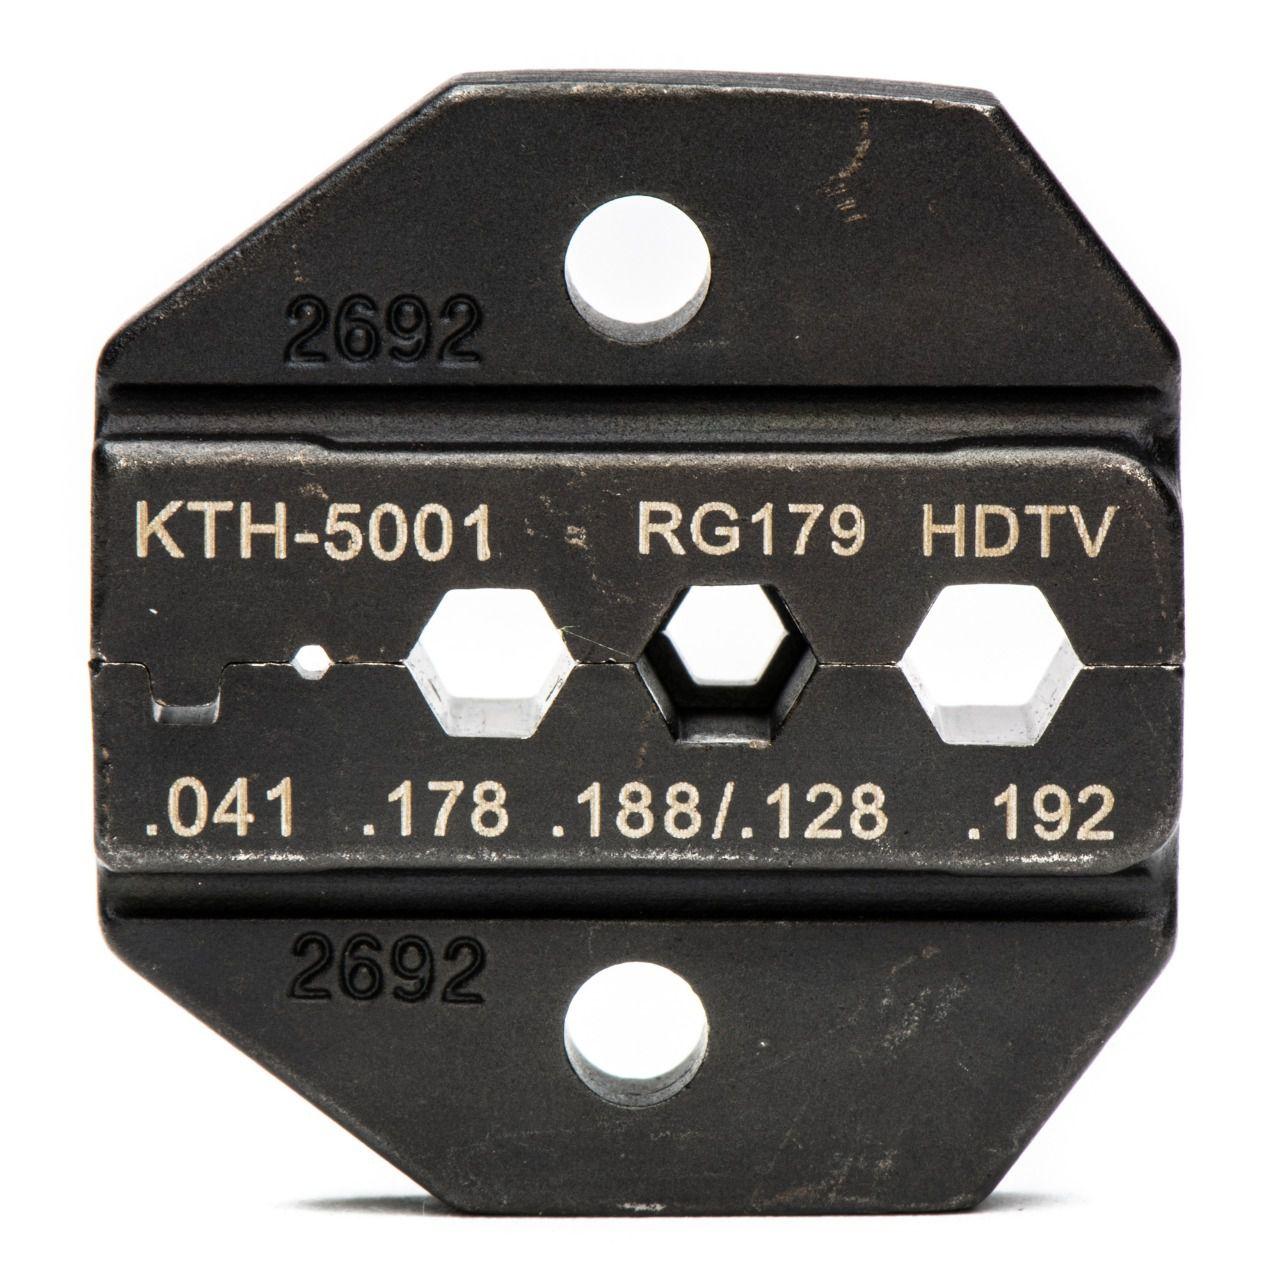 MATRIZ PARA ALICATE DE CRIMPAGEM KTH-5001 (KTH5001) KINGS BRAND